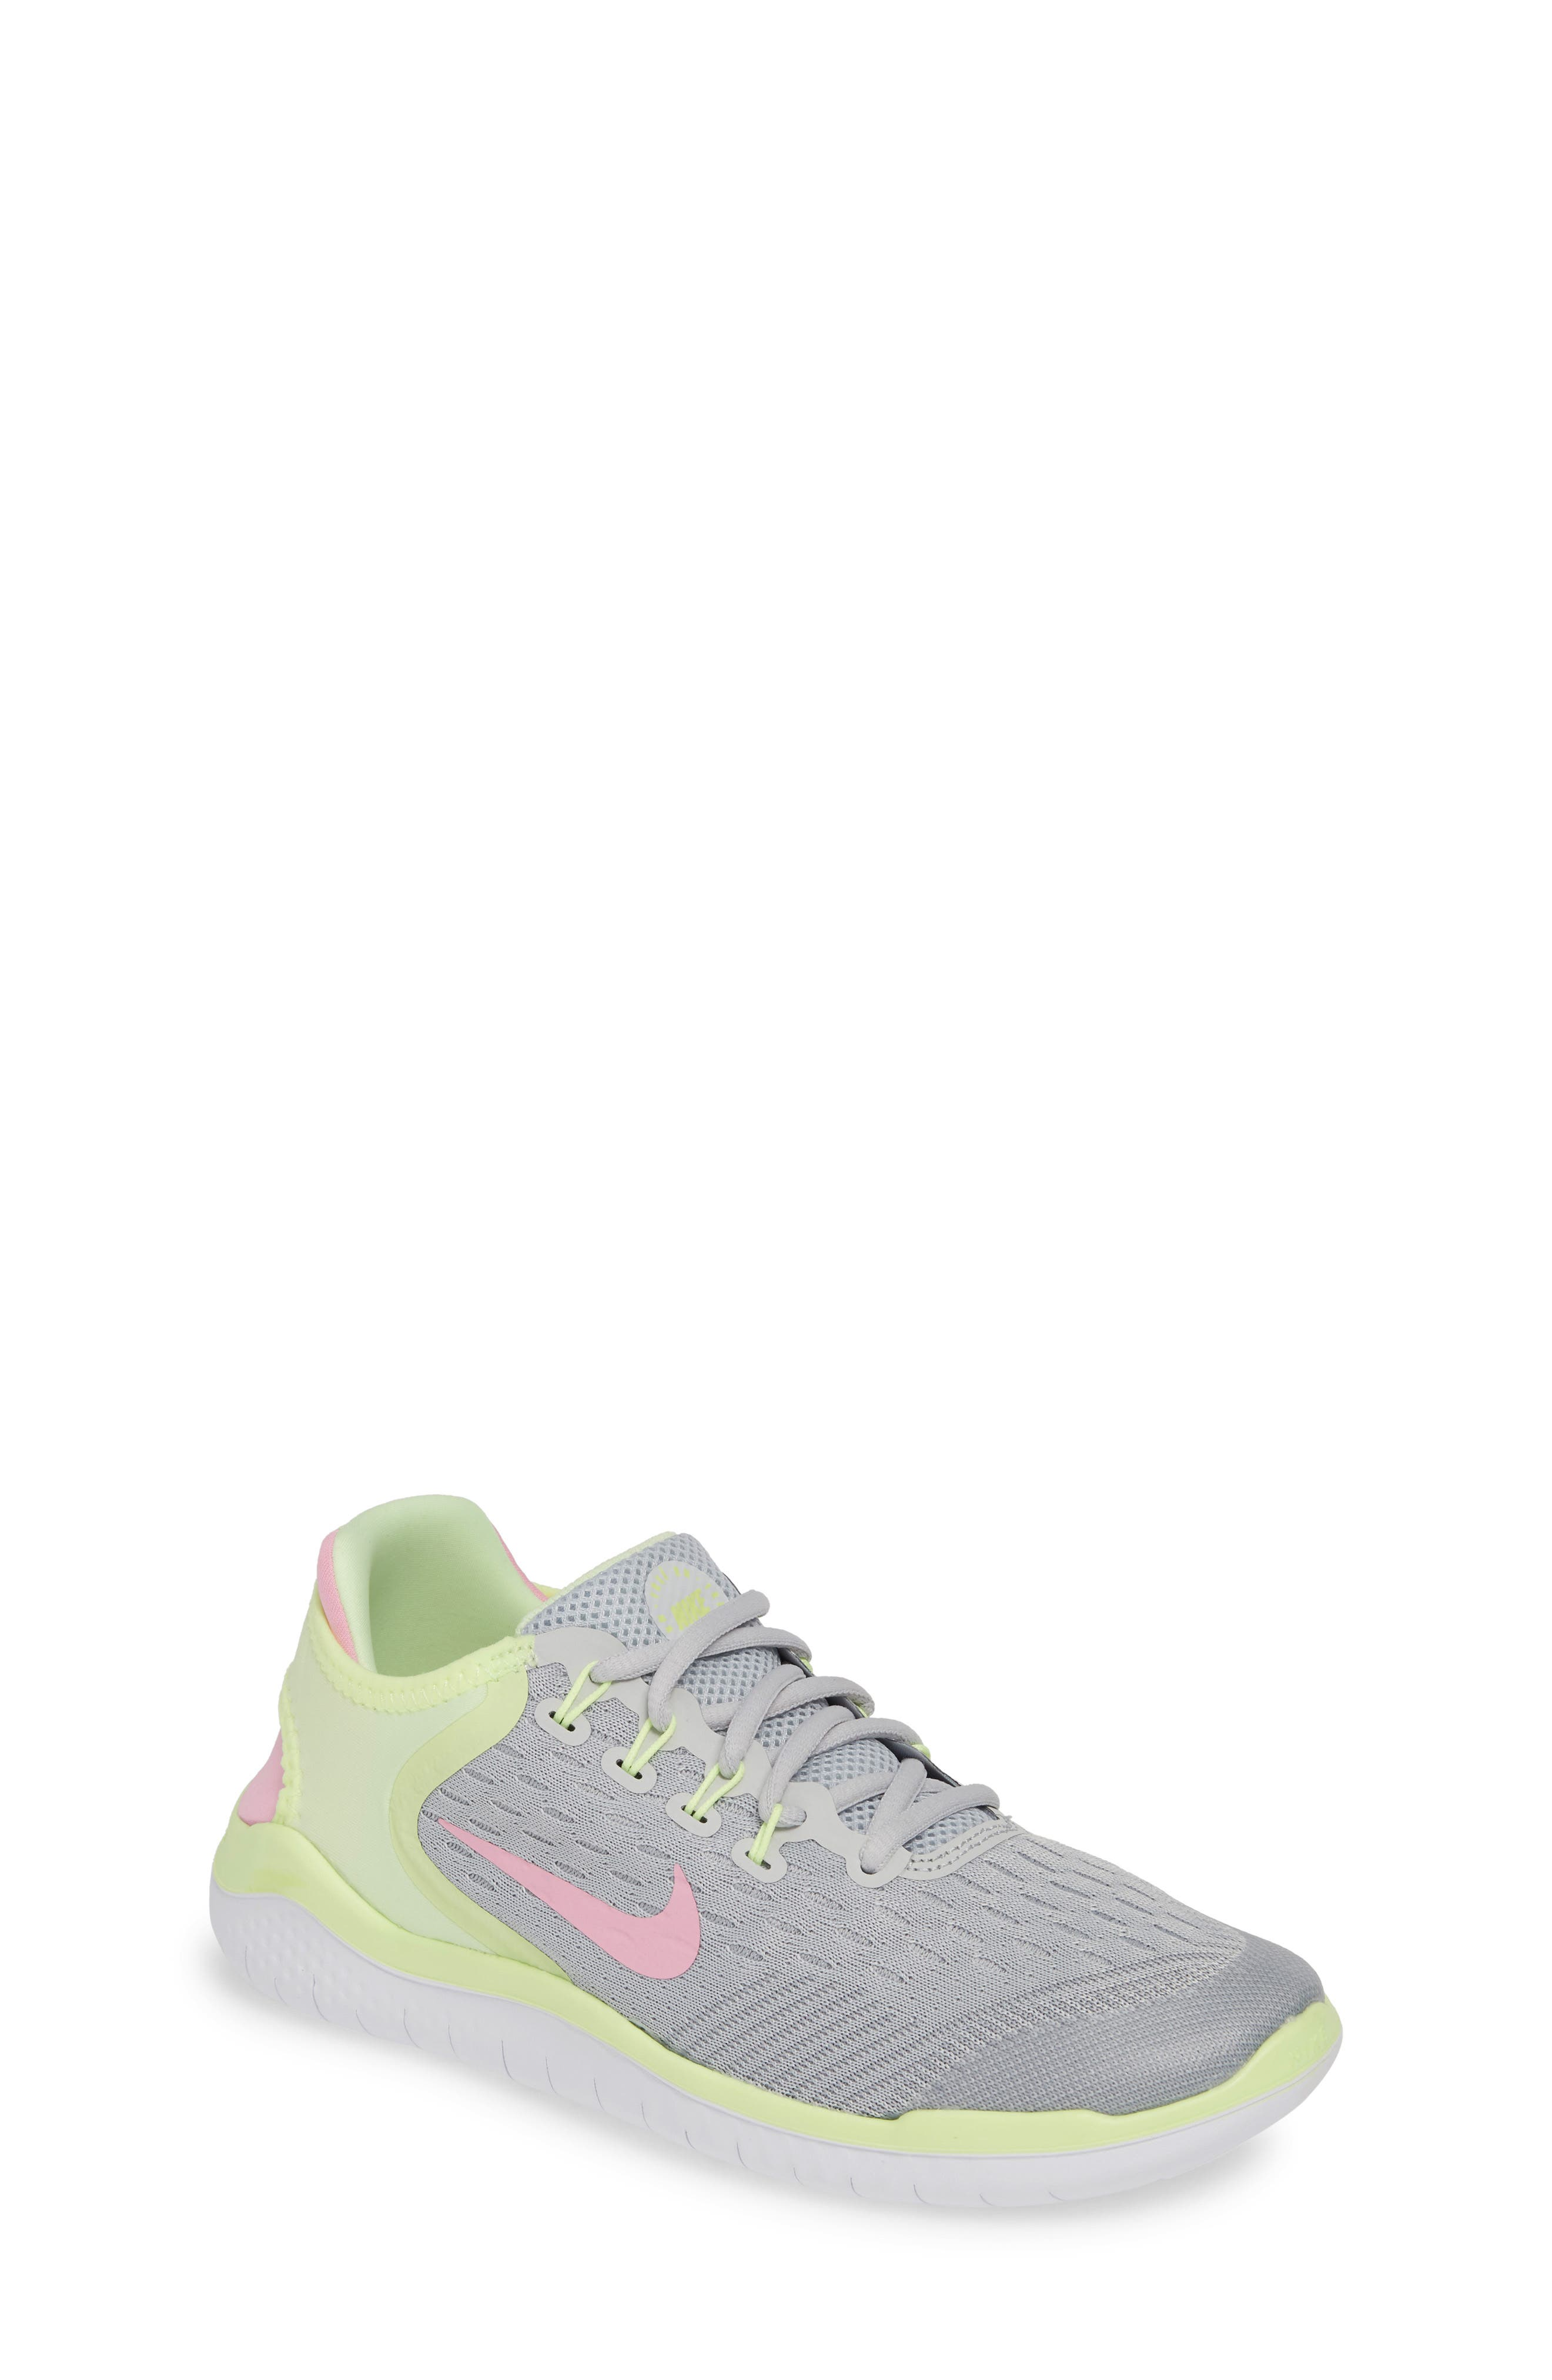 51b36c942c5f Nike Free Run